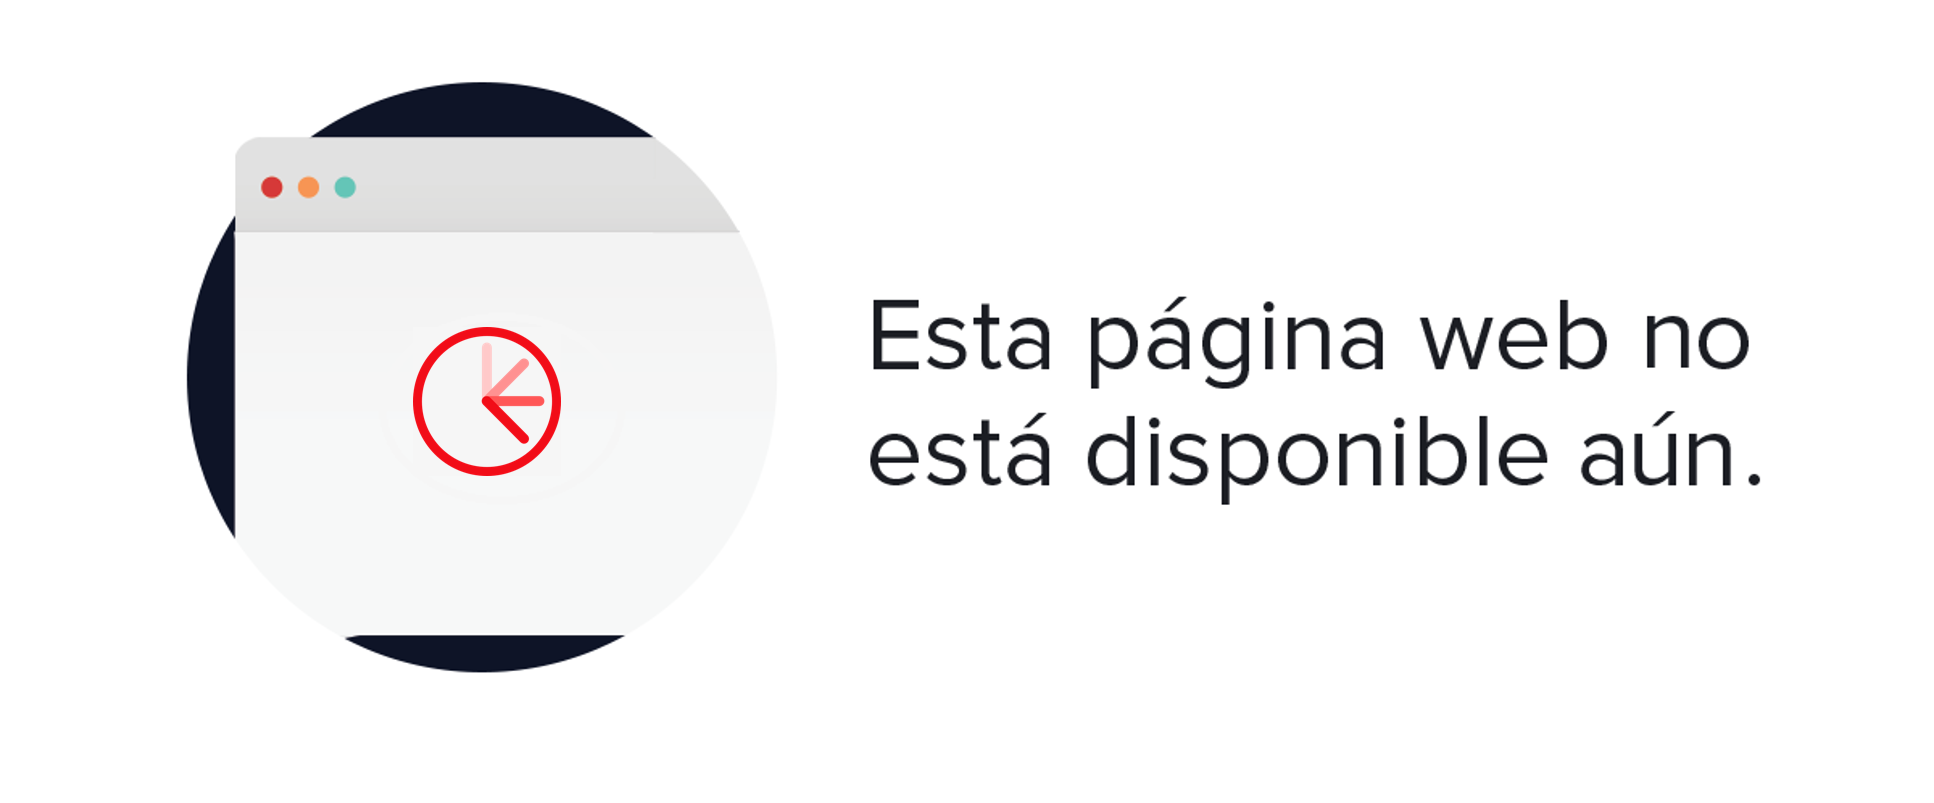 OXXO - Chaqueta de Mujer OXXO larga de rayas horizontales Estampado 8681613249165 - AISJIMJ